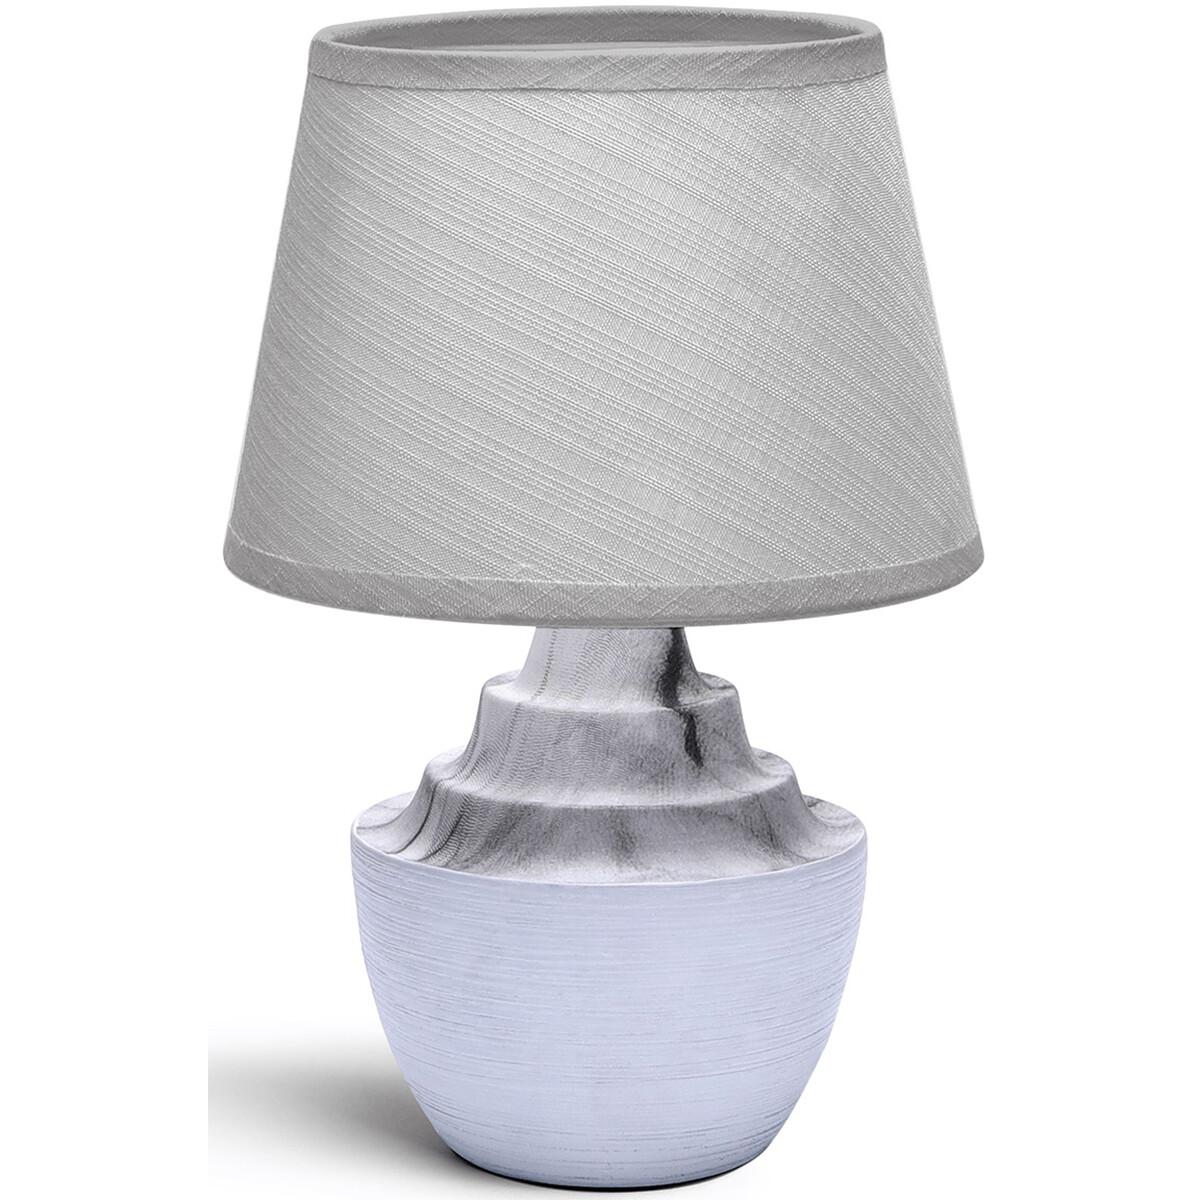 LED Tafellamp - Tafelverlichting - Aigi Fospa - E14 Fitting - Rond - Mat Wit/Grijs - Keramiek